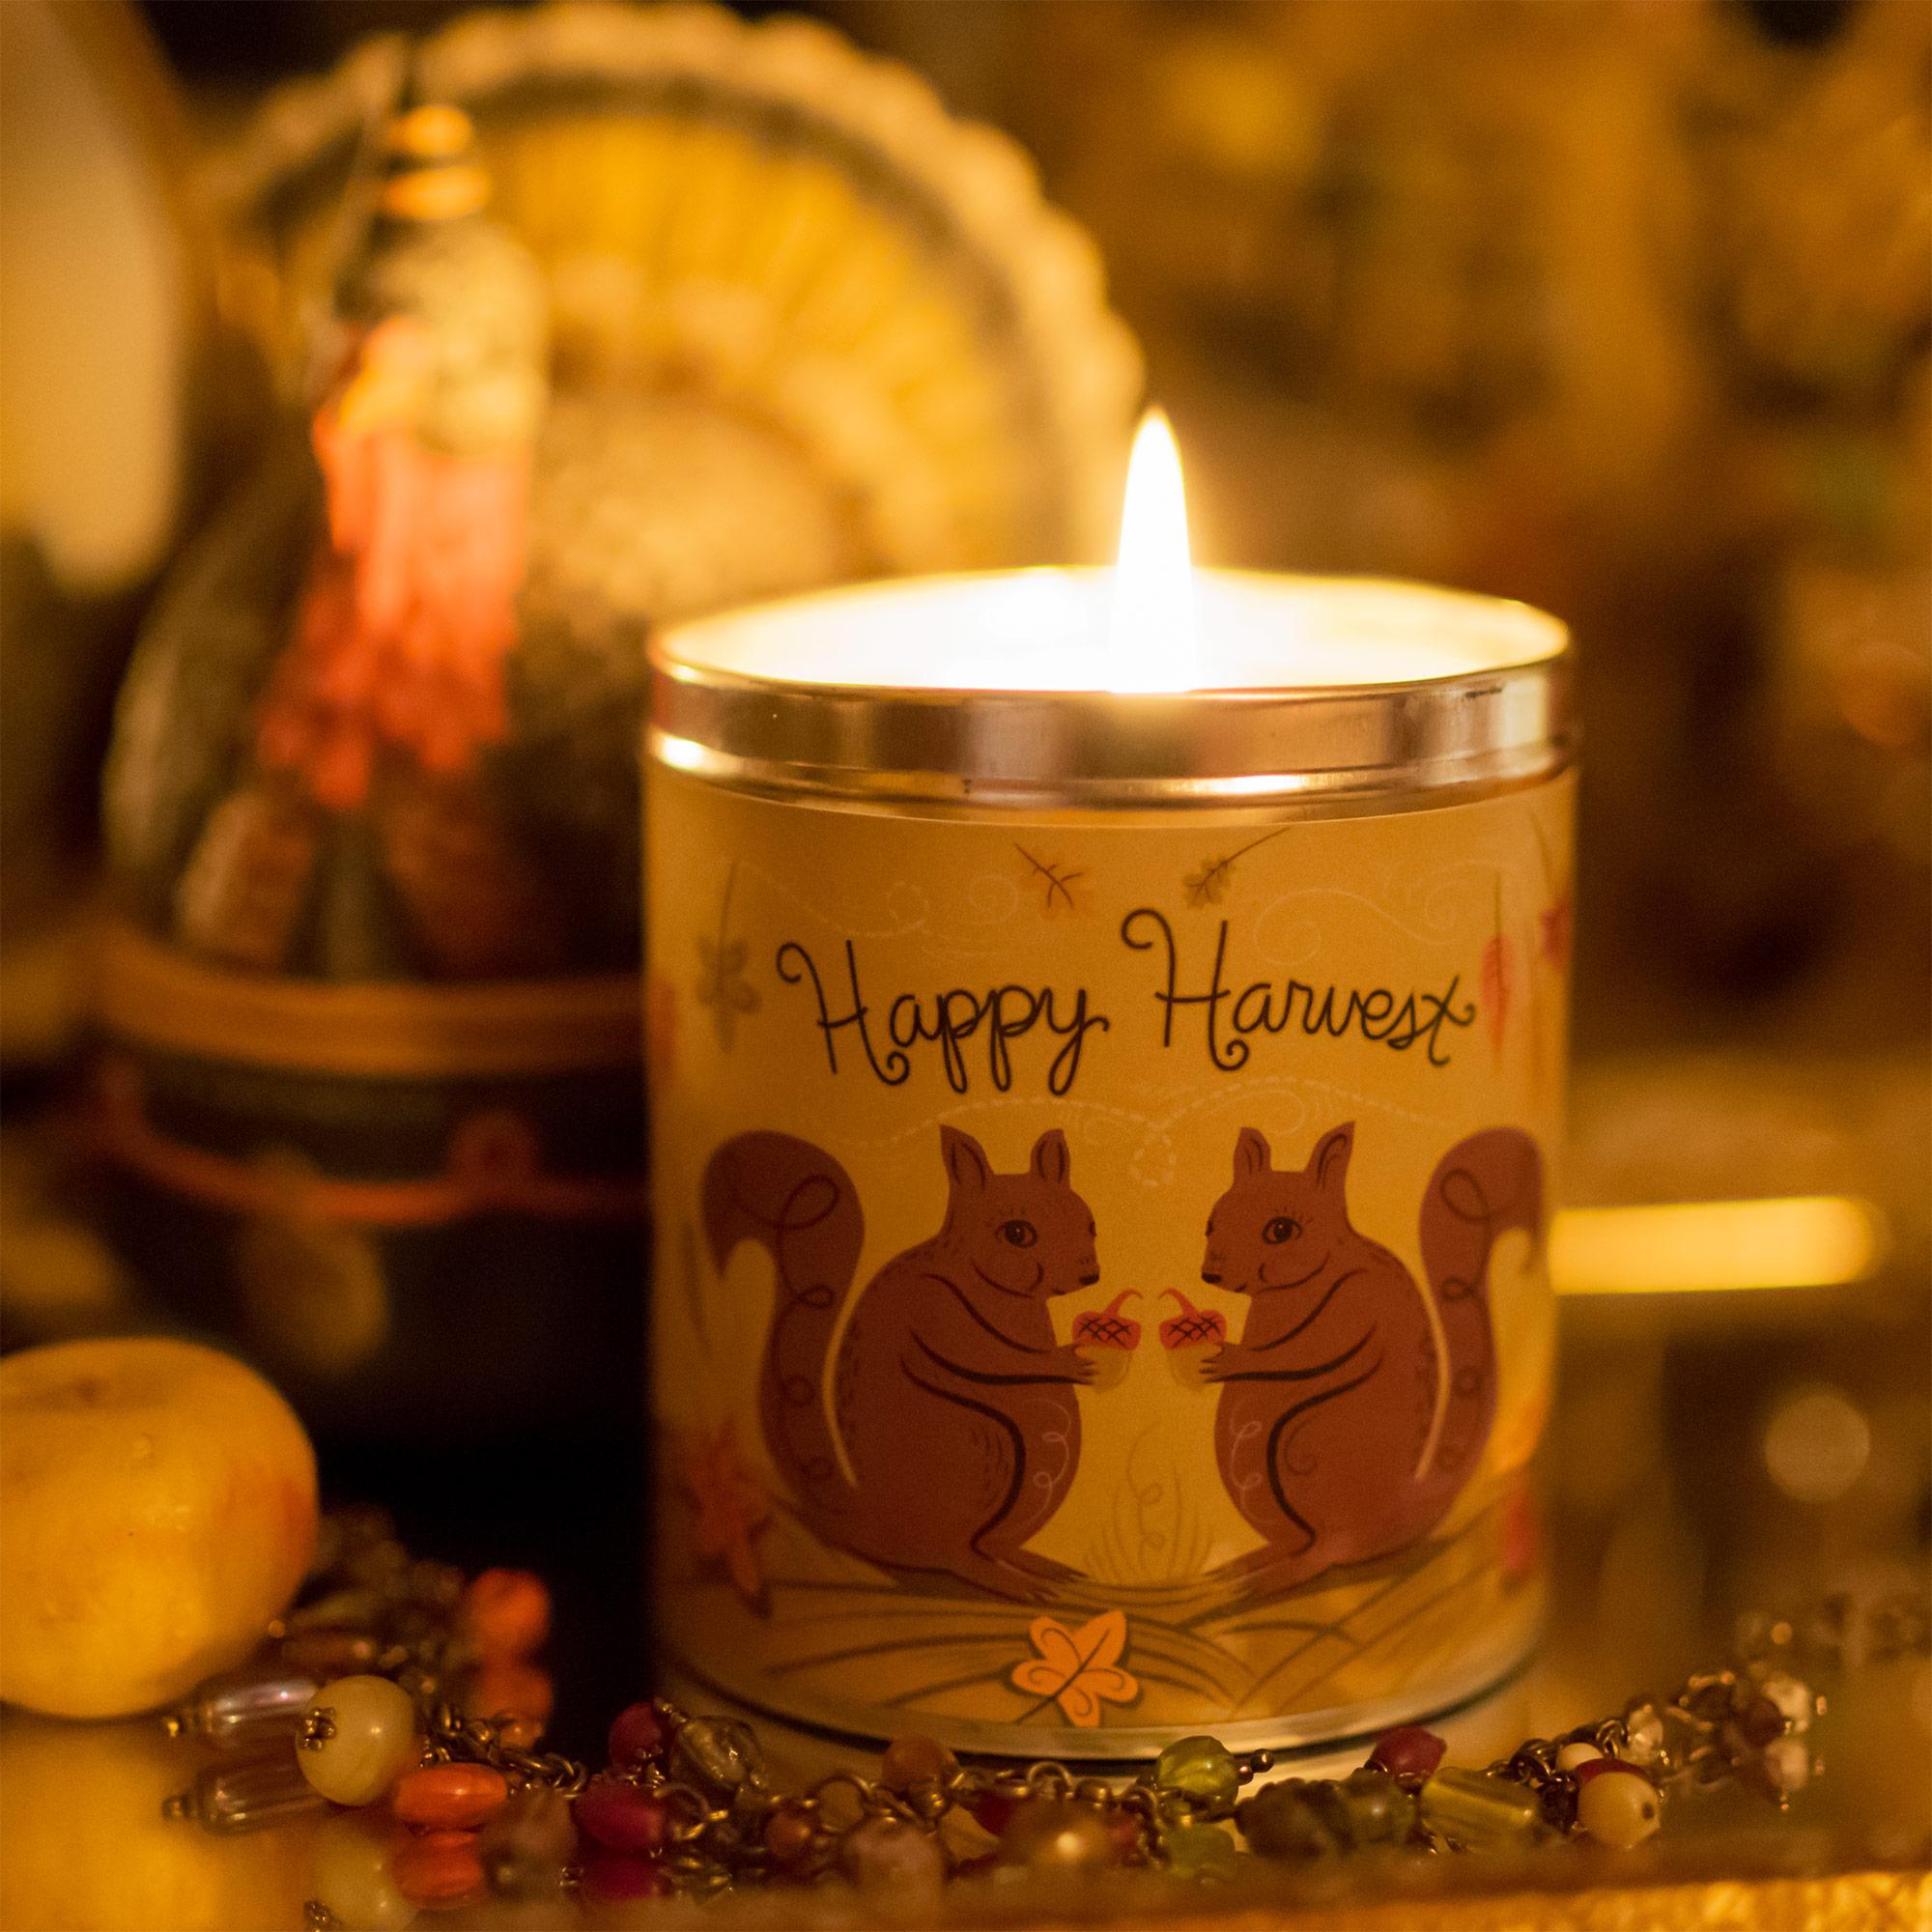 Aunt-Sadies-Happy-Harvest-Squirrel-Candle-Johanna-Parker.jpg